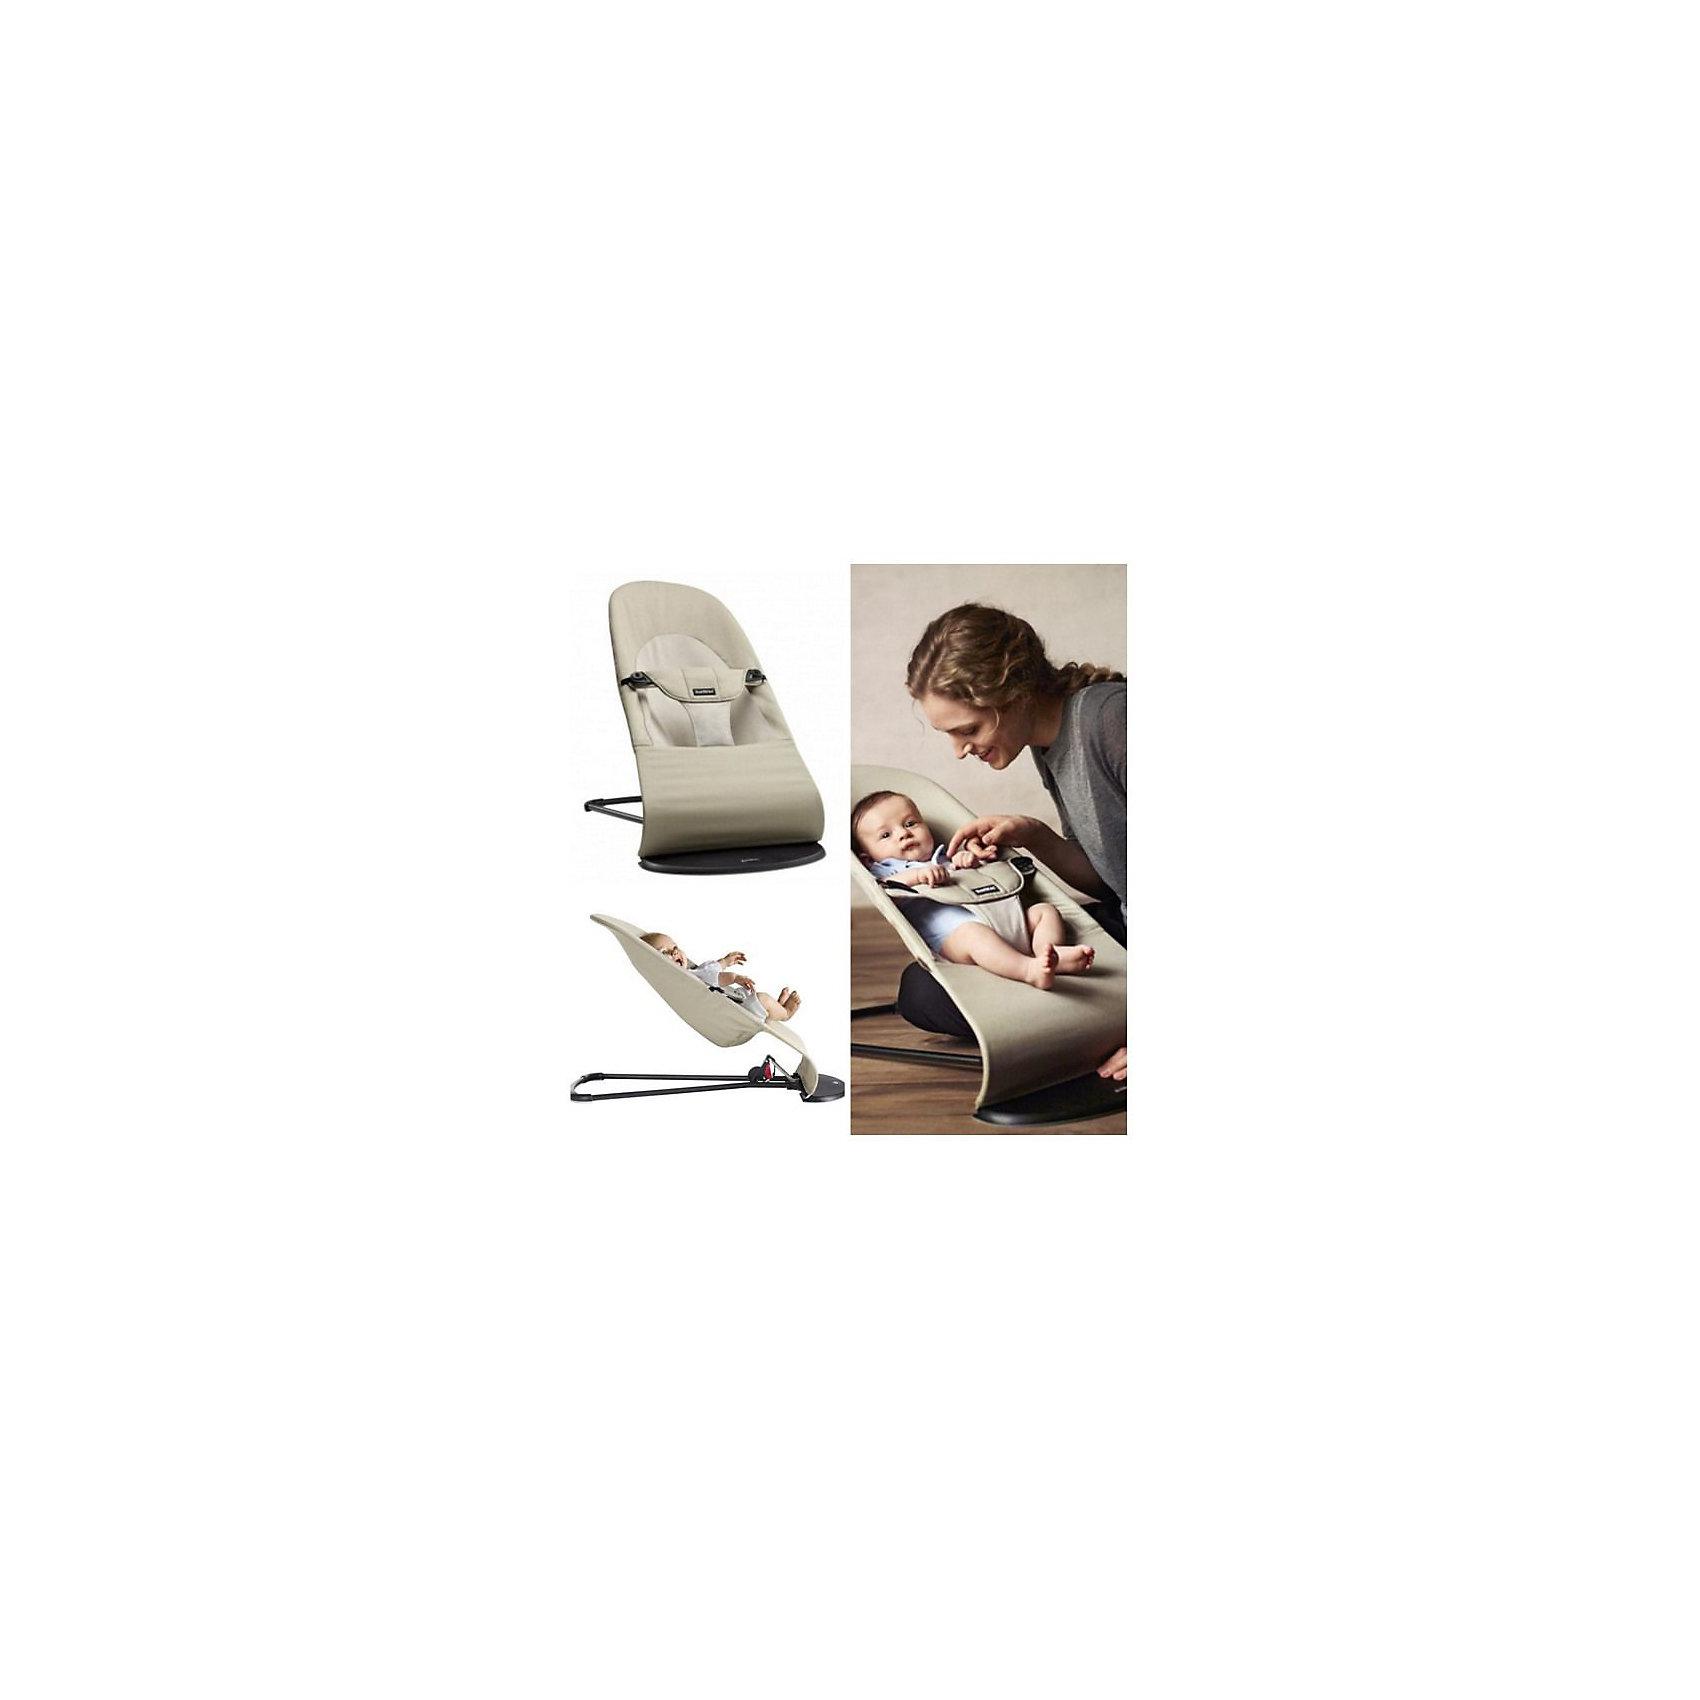 Кресло-шезлонг Balance Soft Air, BabyBjorn, серый с белым